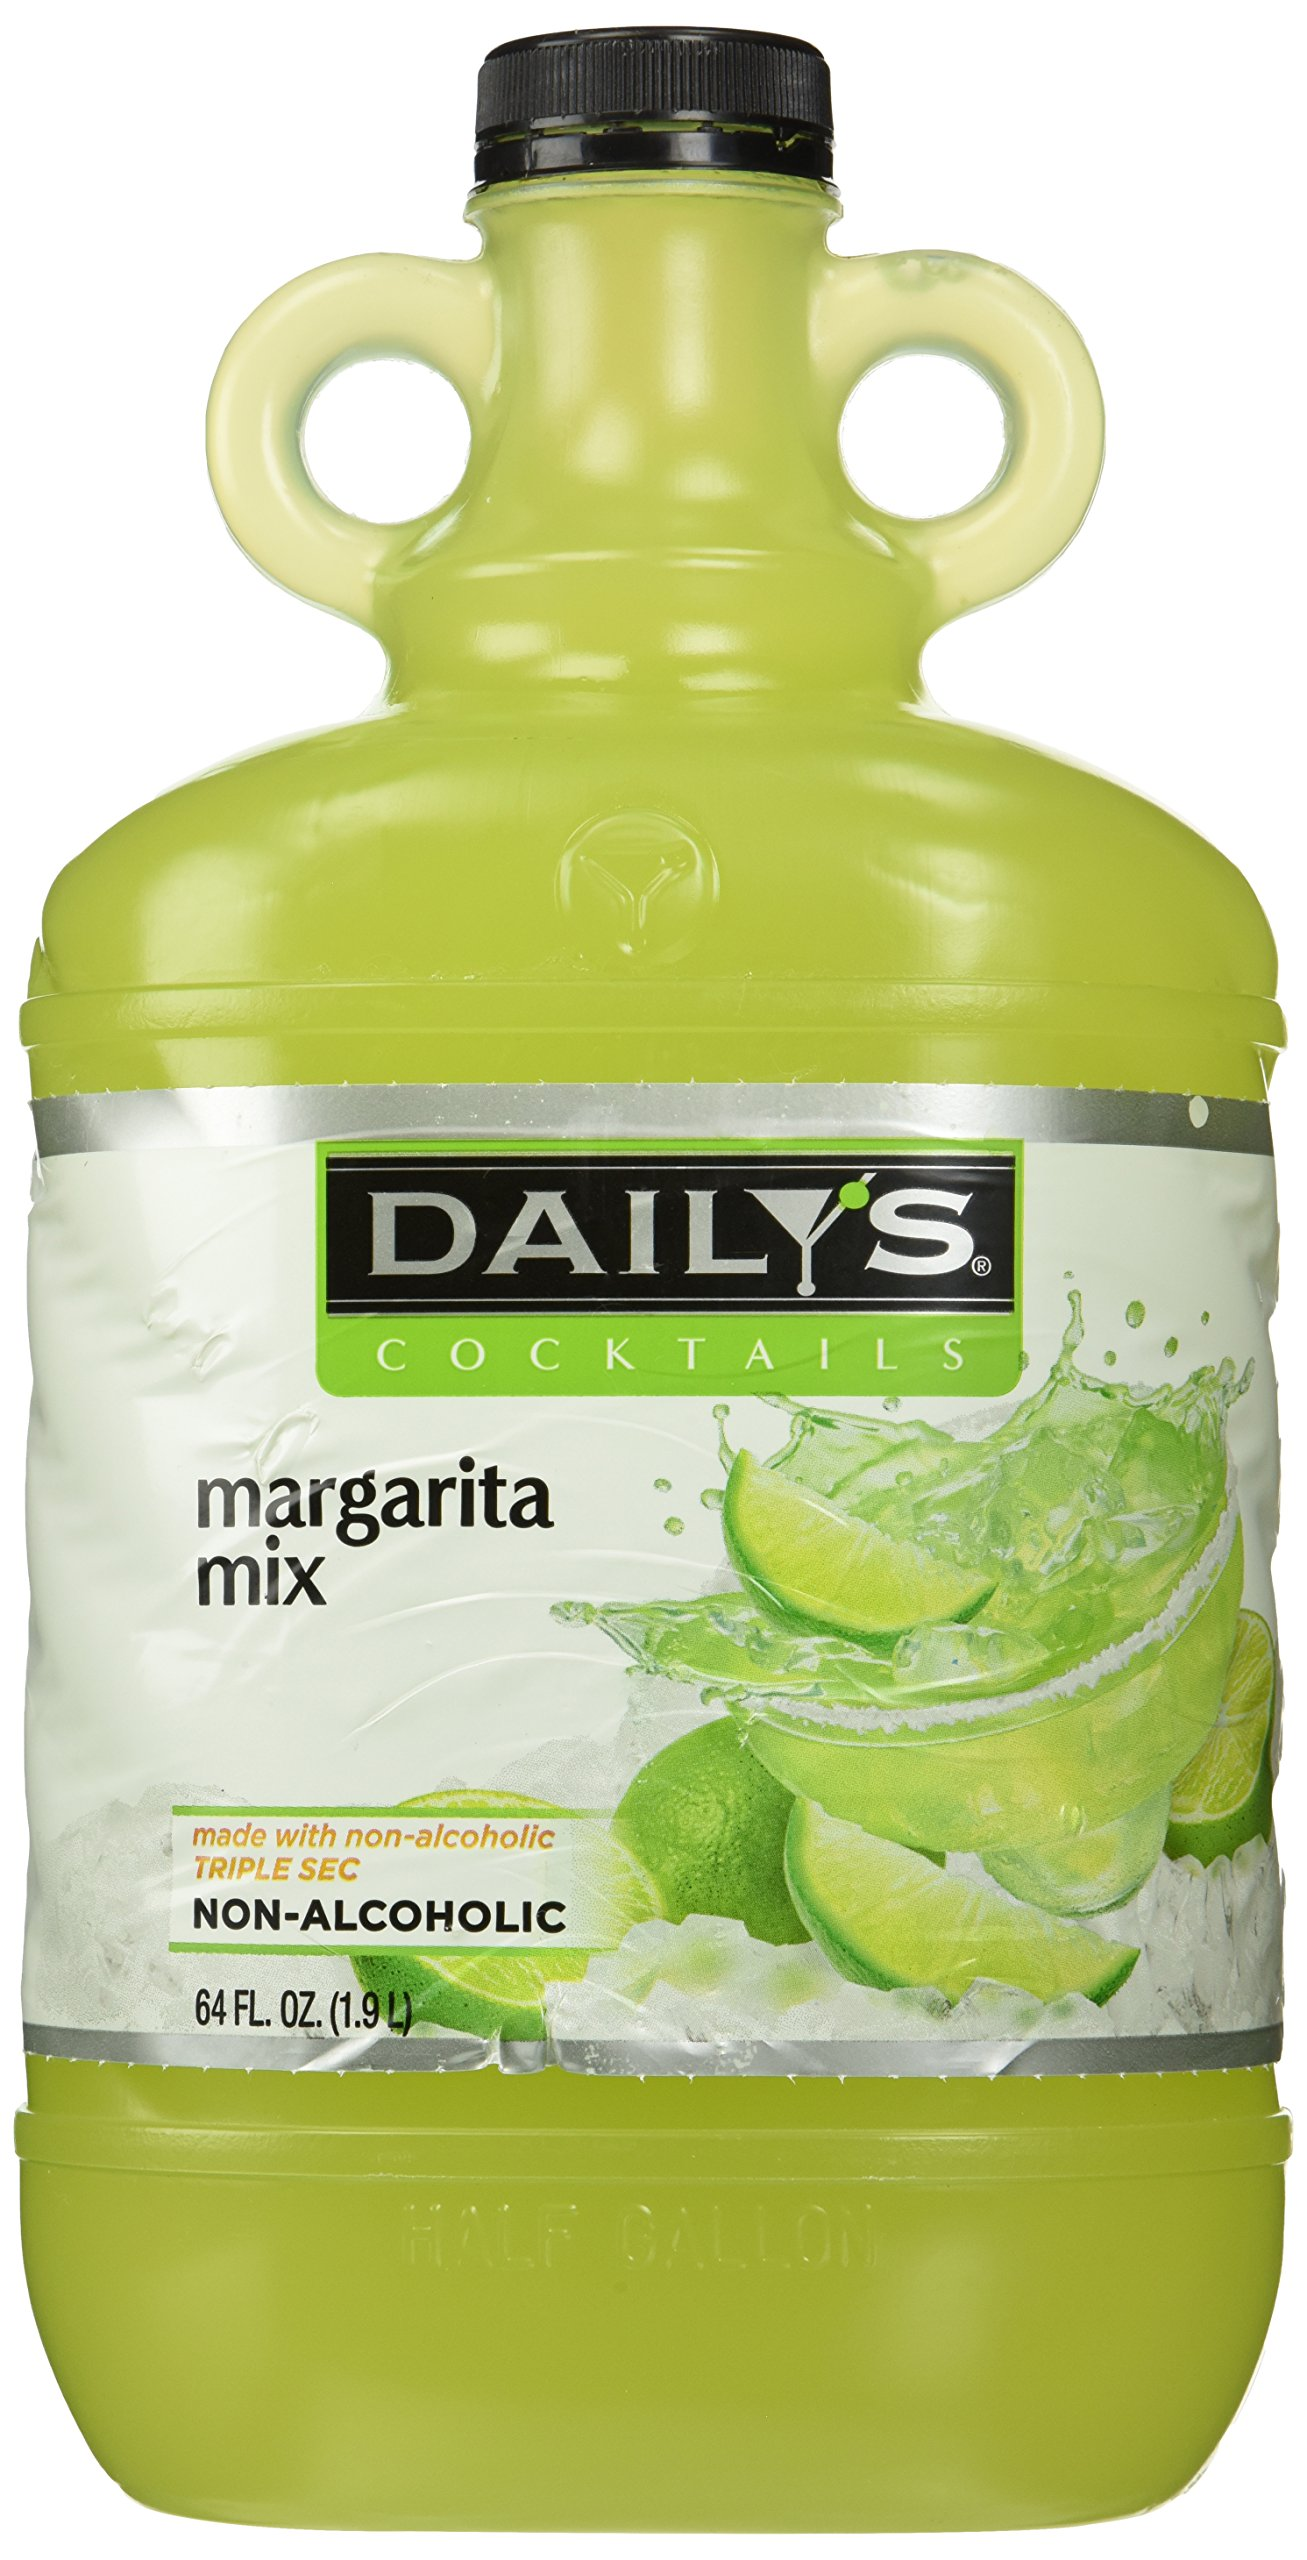 Daily's Margarita Mix 64oz